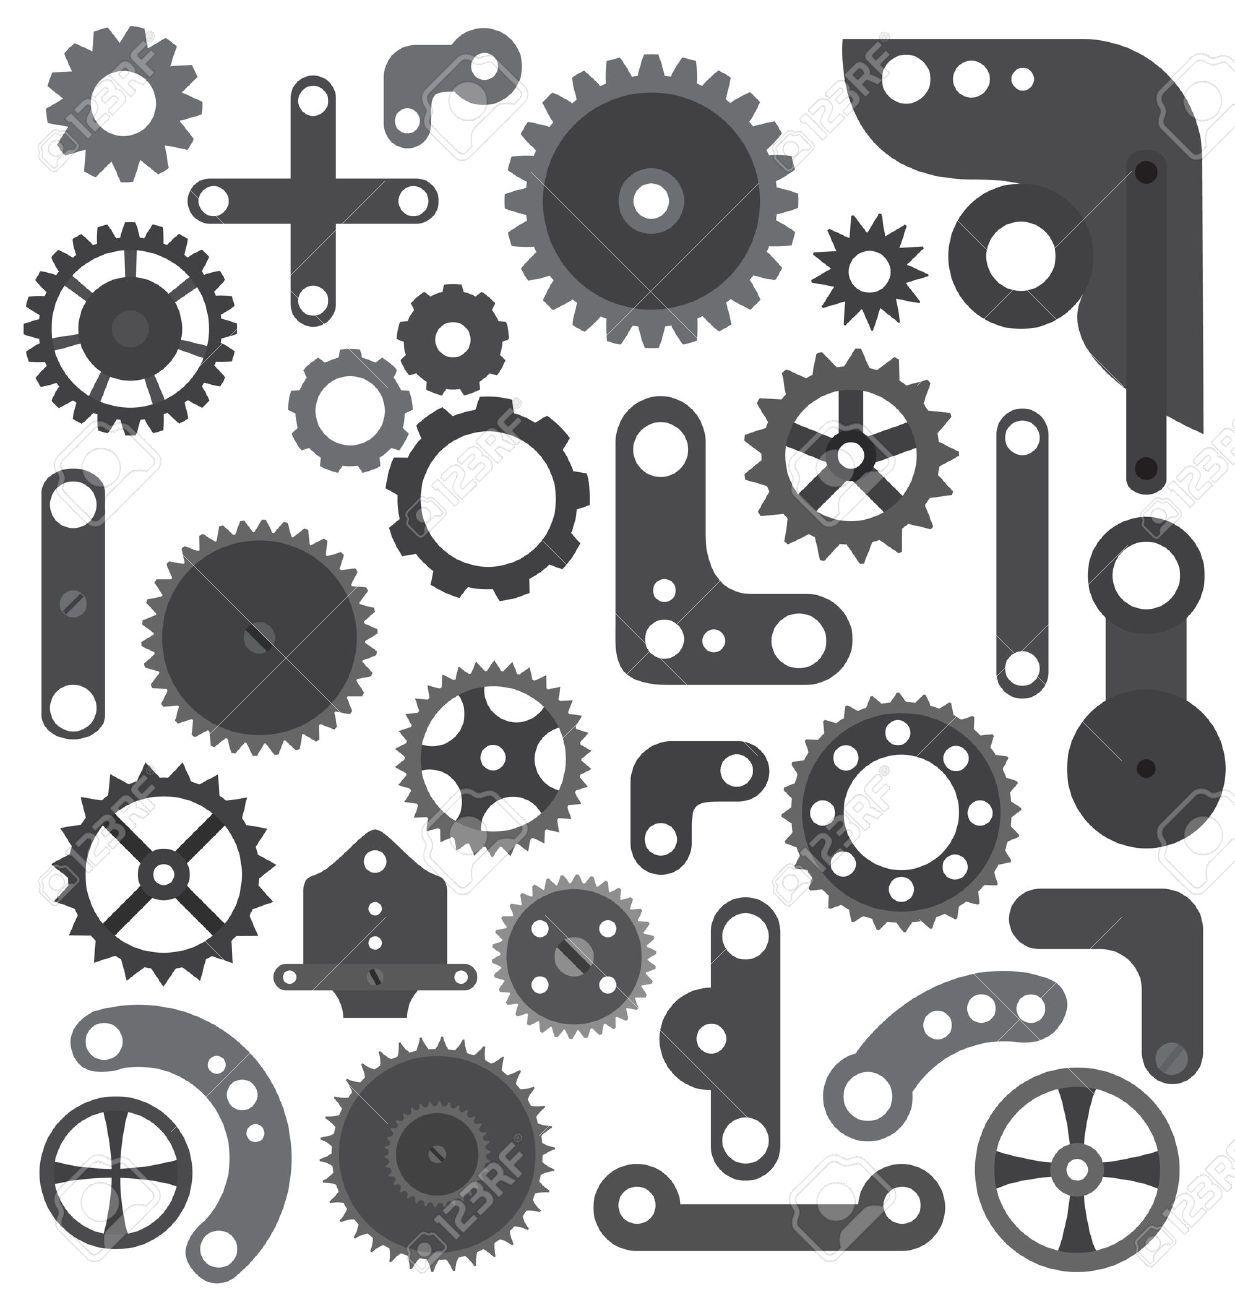 Pin on Gears, Clocks, Keys Silhouettes, Vectors, Clipart.